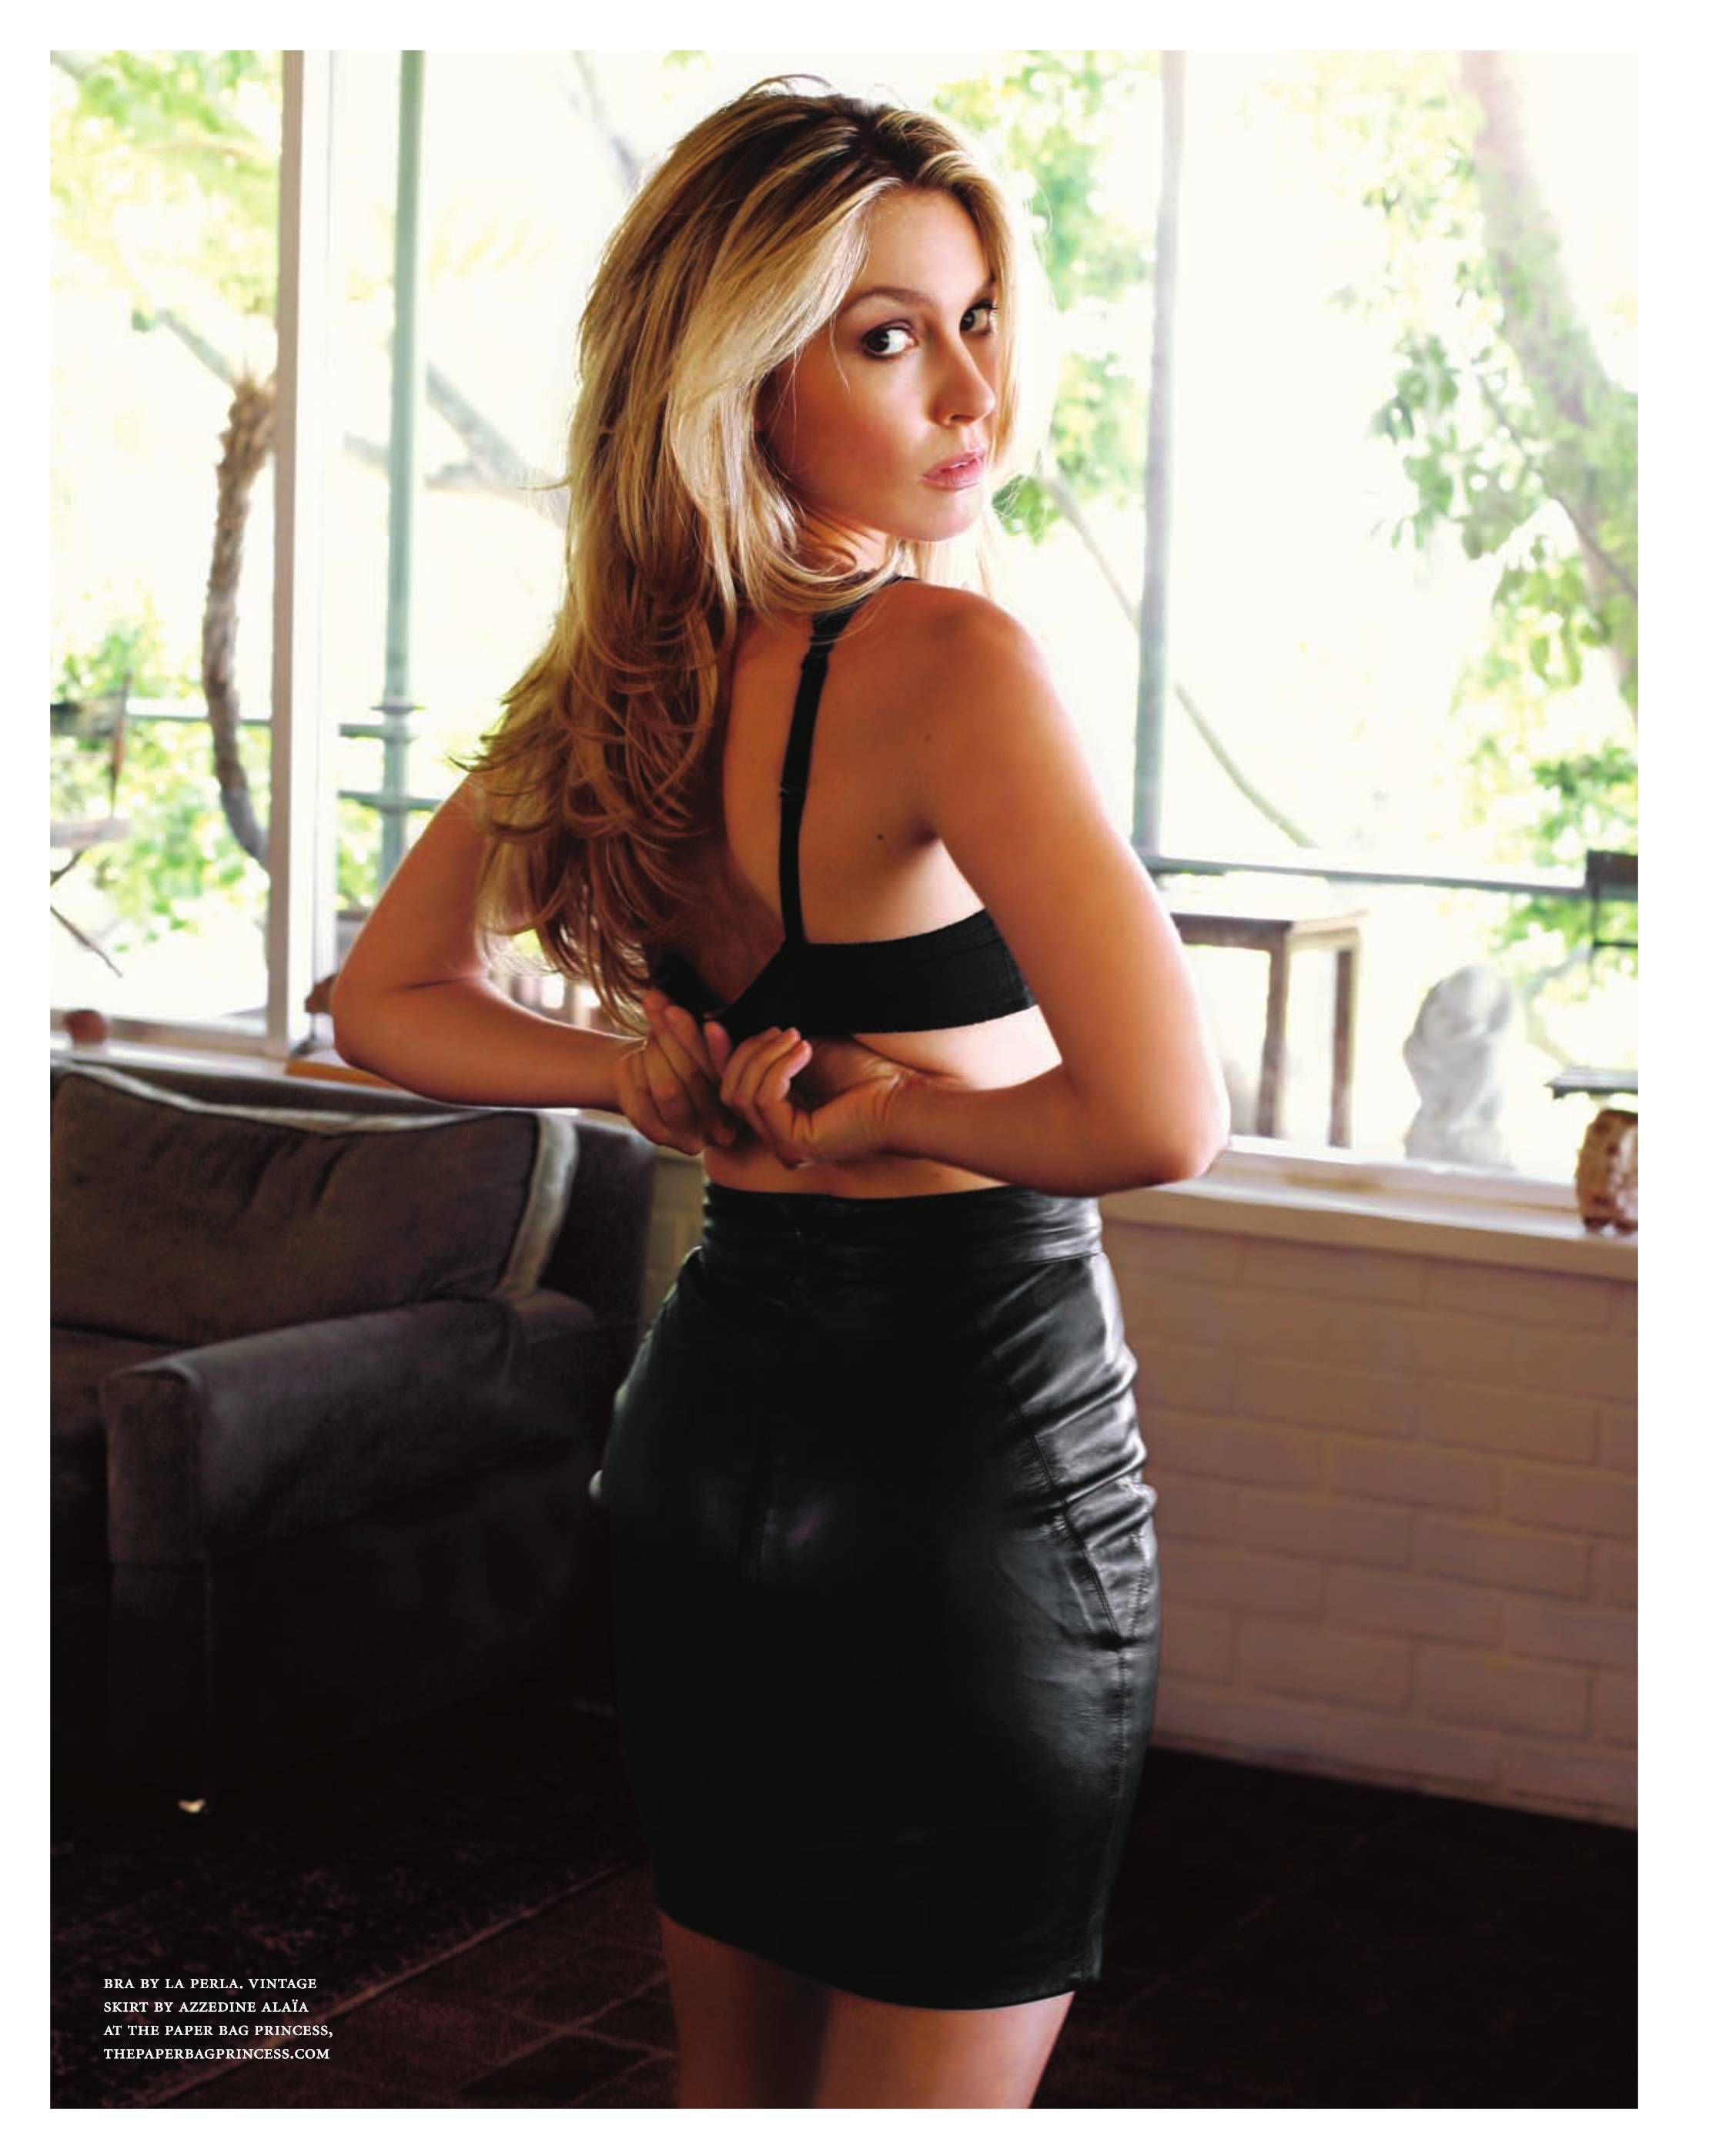 Beautiful Girl Wallpaper Desktop Sarah Carter Heleena Vesala Pinterest Glamour And Models